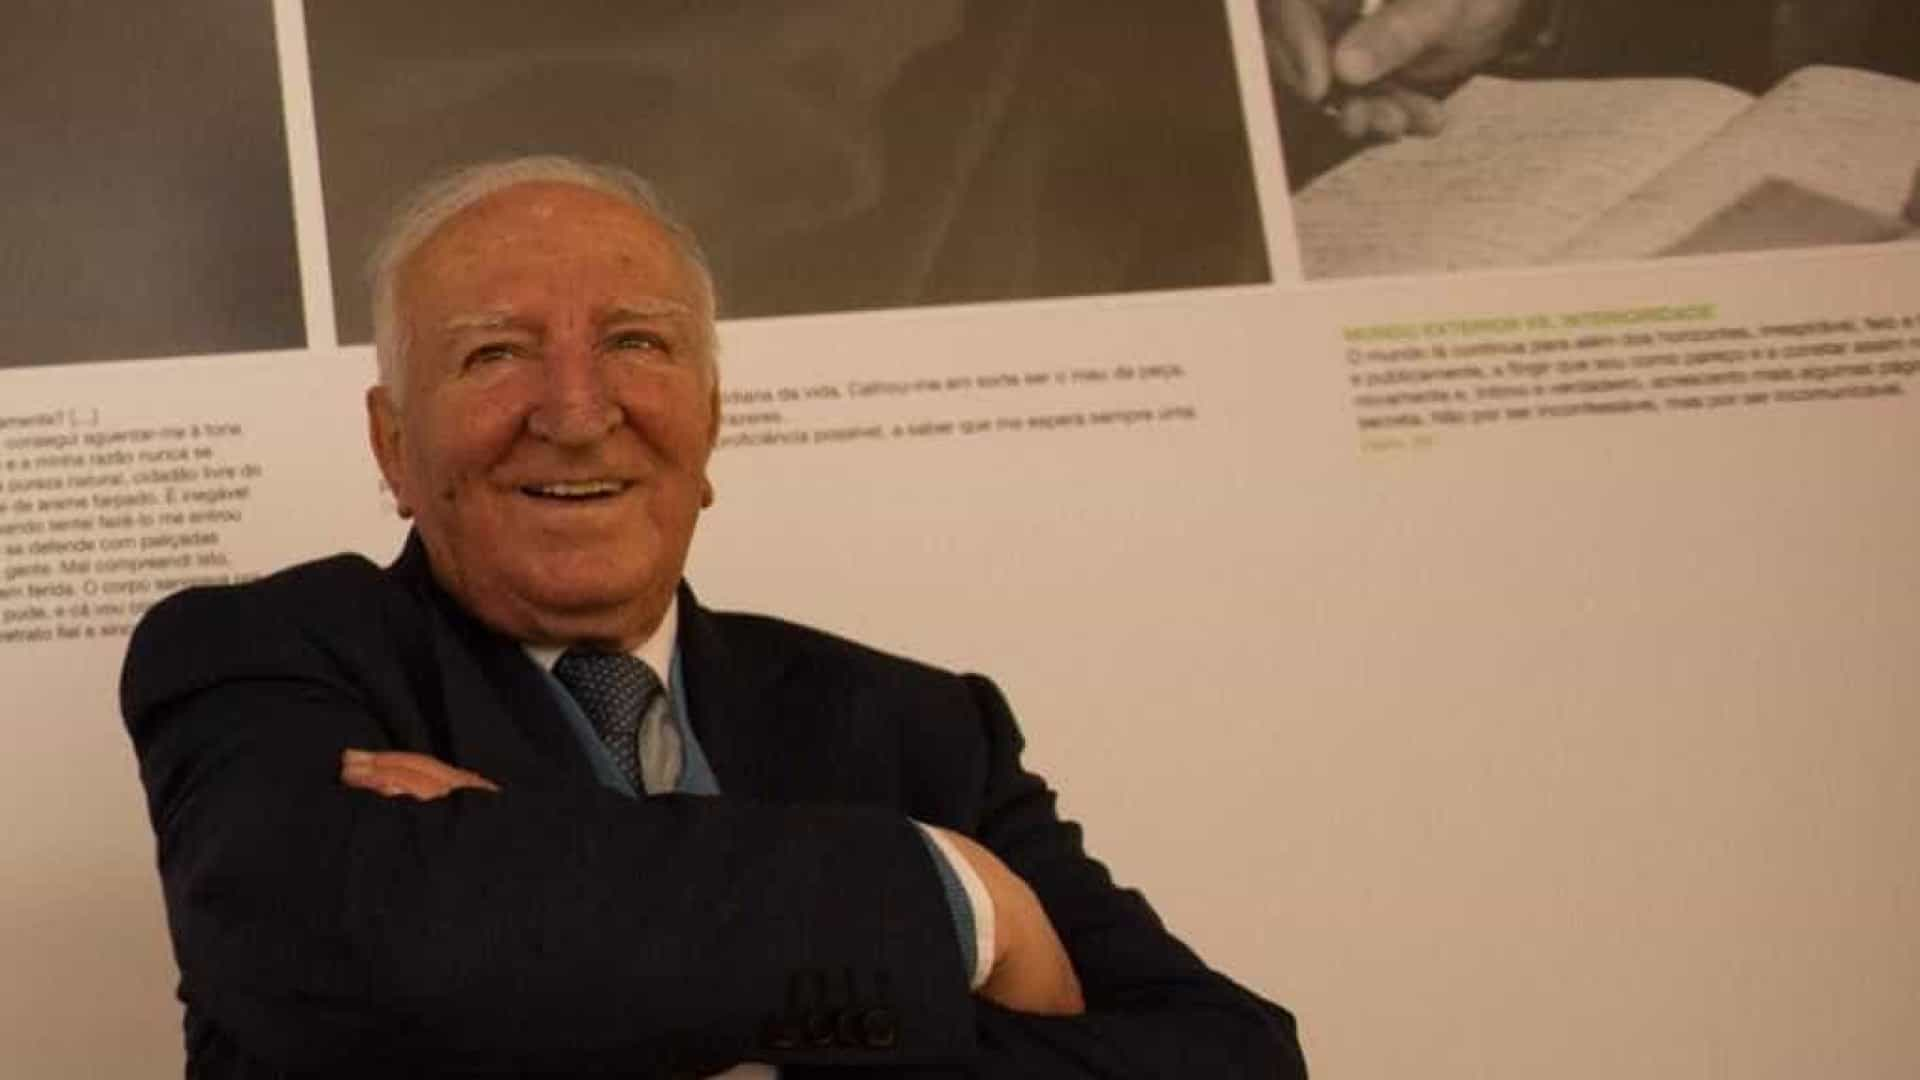 Ministro enaltece Eduardo Lourenço aos 95 anos por liberdade e lucidez